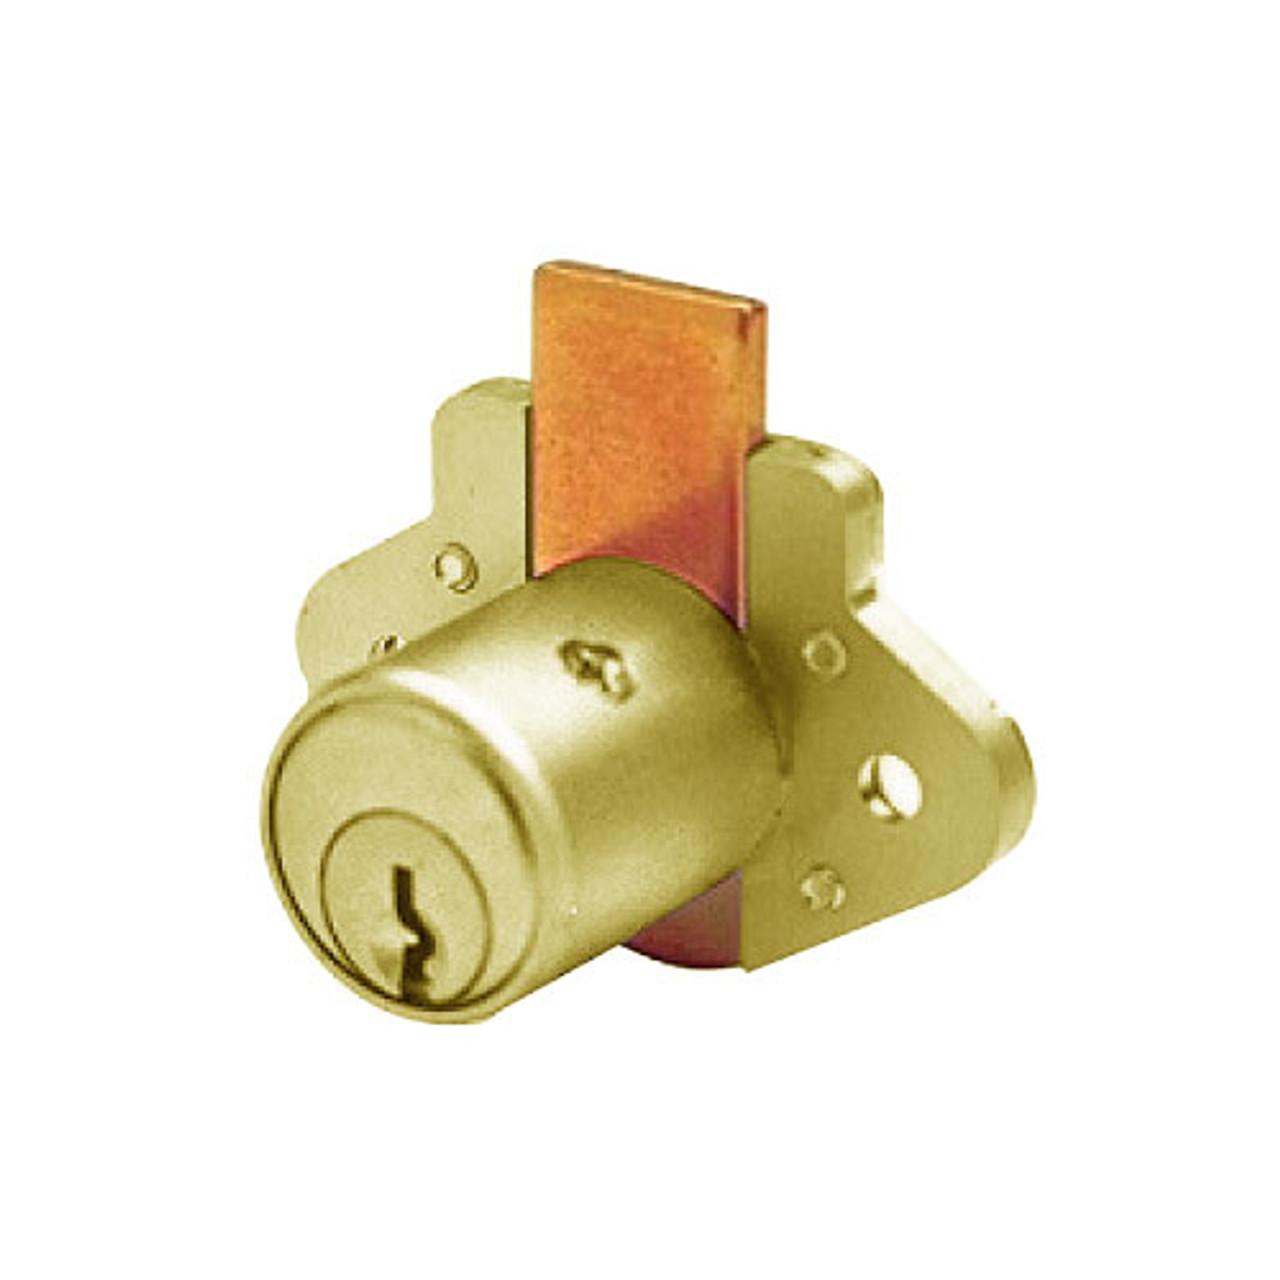 Olympus N078-KA101-US4 Cabinet Lock Diamond Back Drawer Lock in Satin Brass Finish